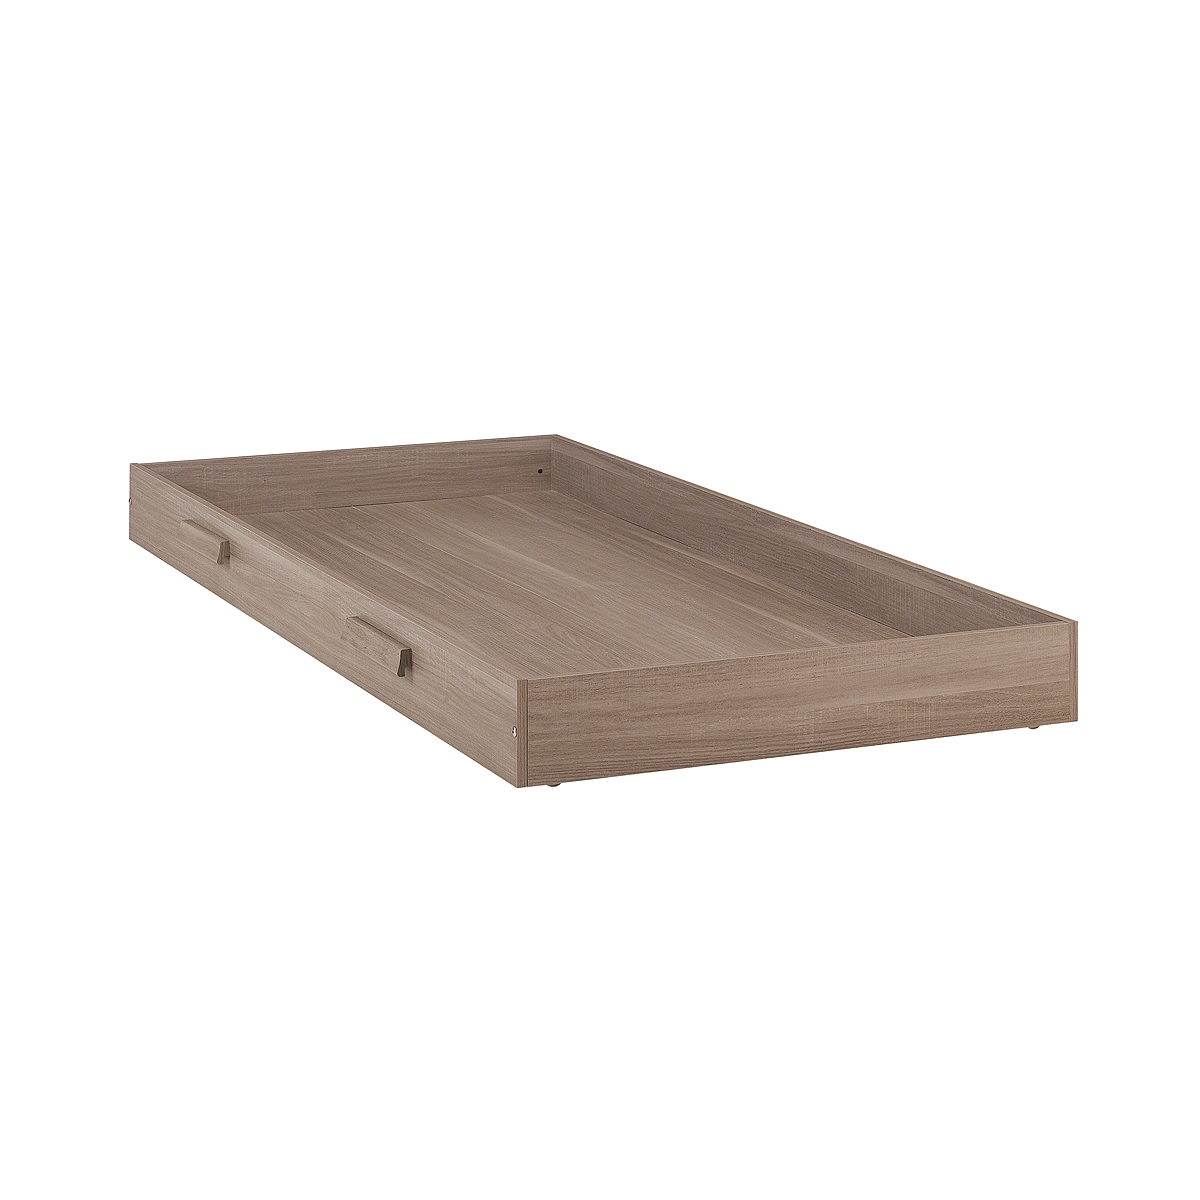 tiroir de lit 190cm gami hangun bois lits tiroir de. Black Bedroom Furniture Sets. Home Design Ideas